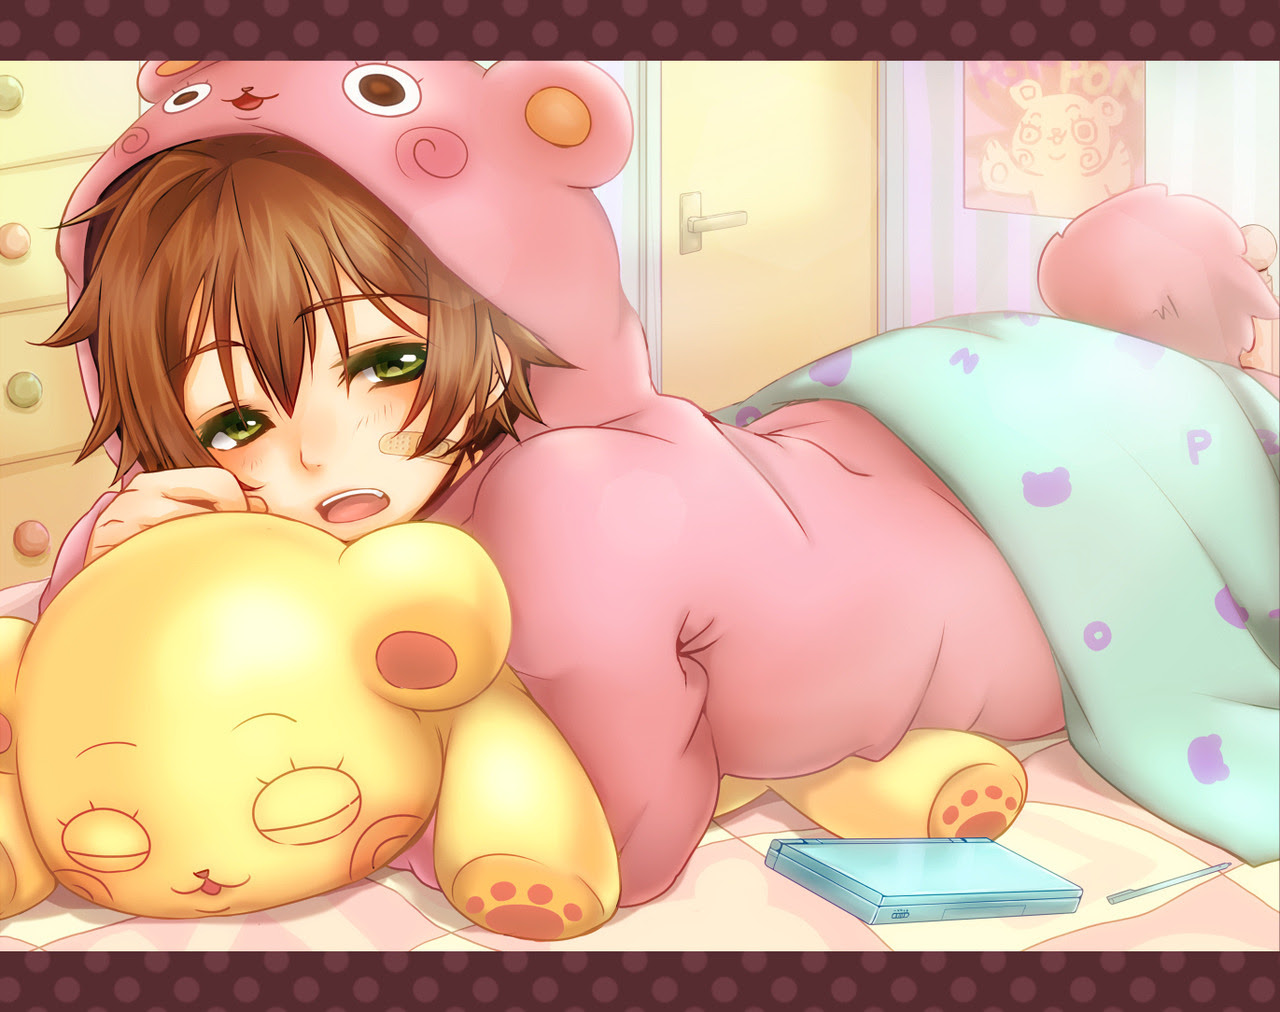 http://24.media.tumblr.com/tumblr_m5rq0ohdrE1ry5urko1_1280.jpg